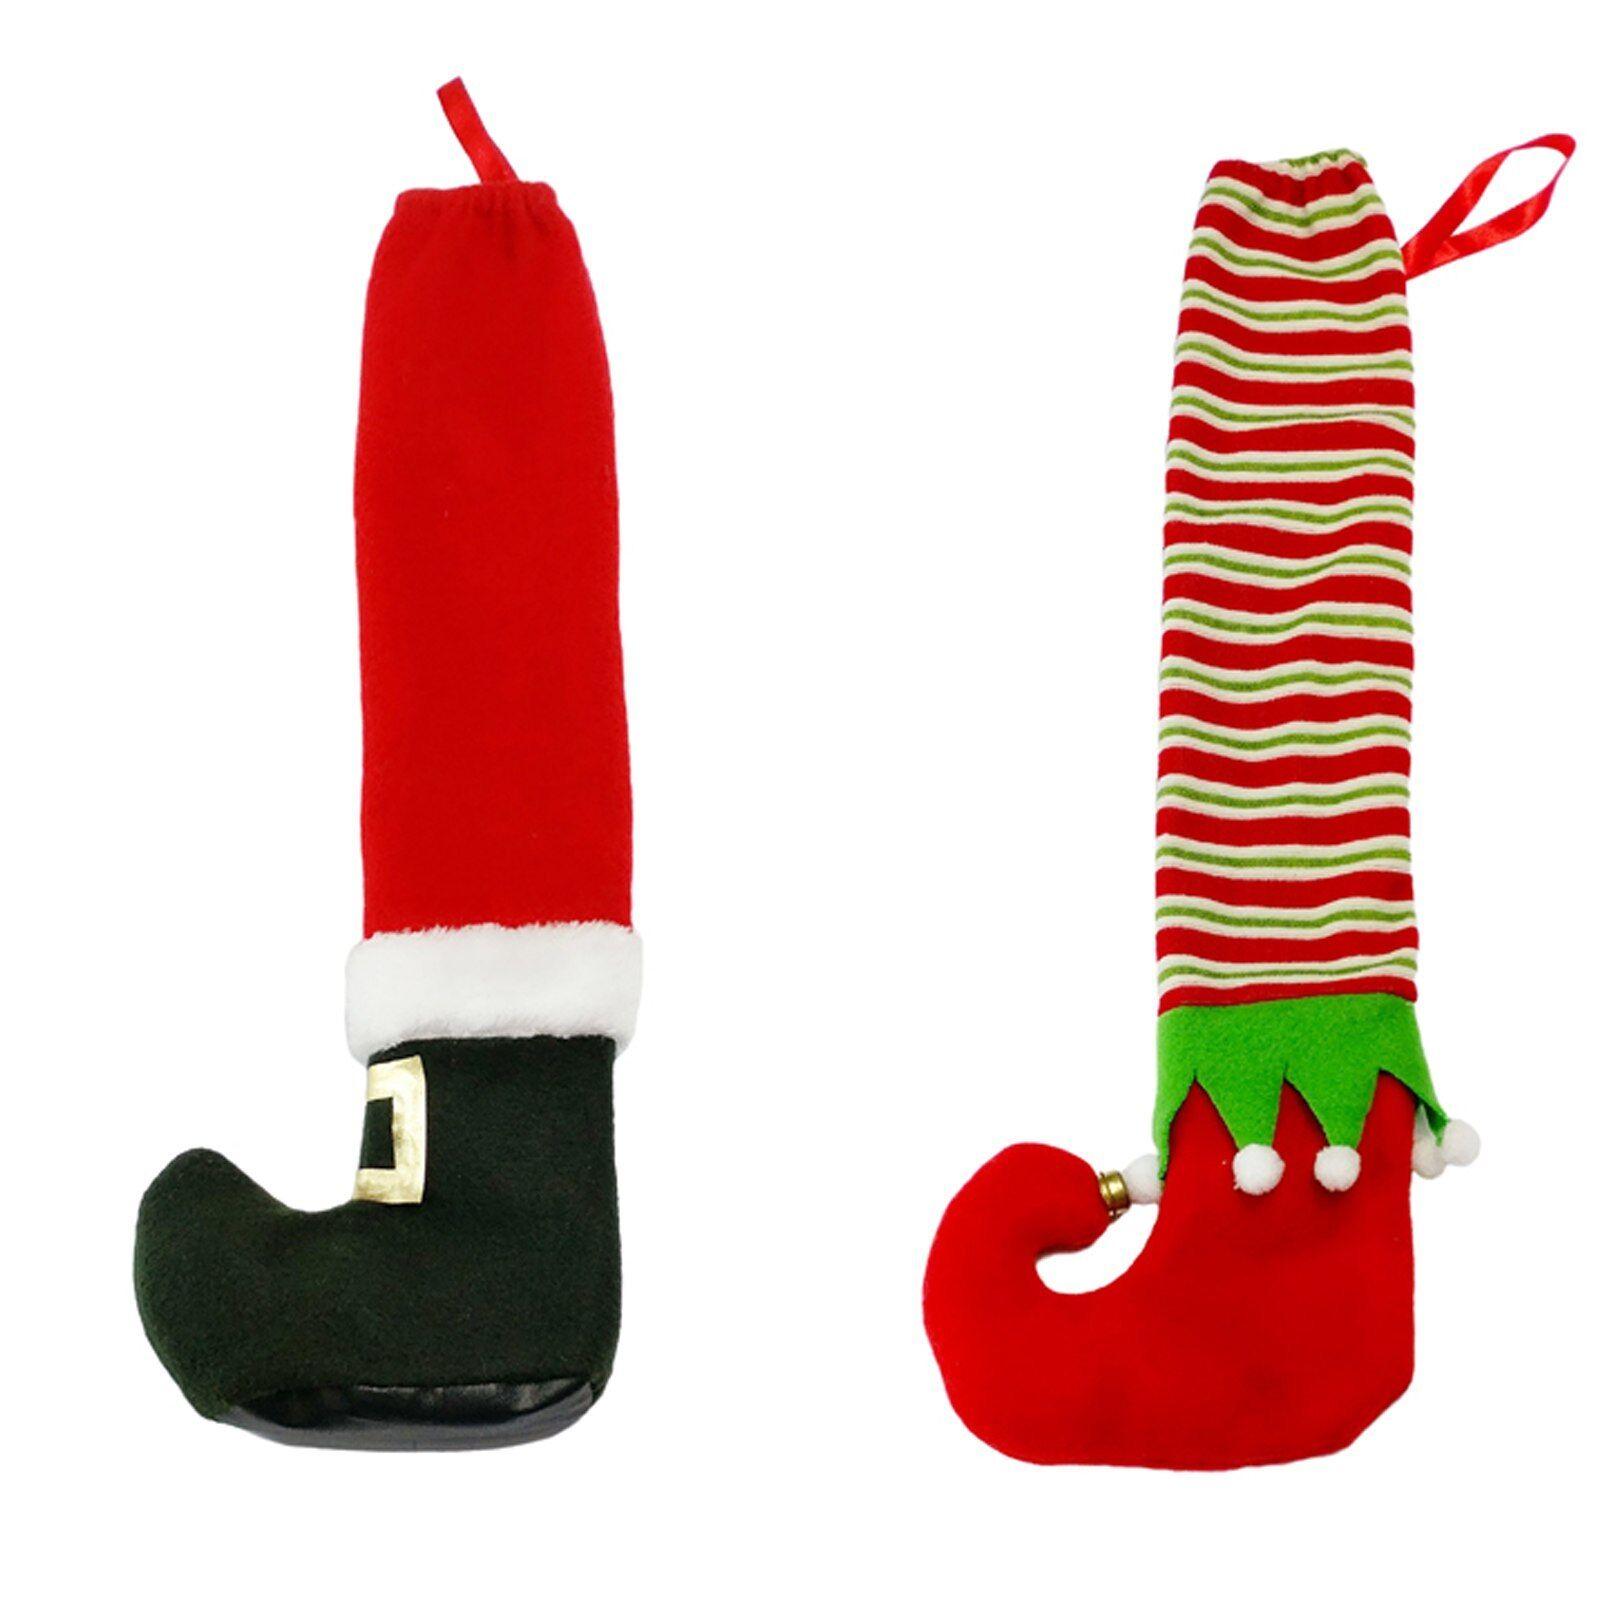 2//4PCS Christmas Chair Foot Socks Table Legs Cover Stocking Santa//Elves Boots